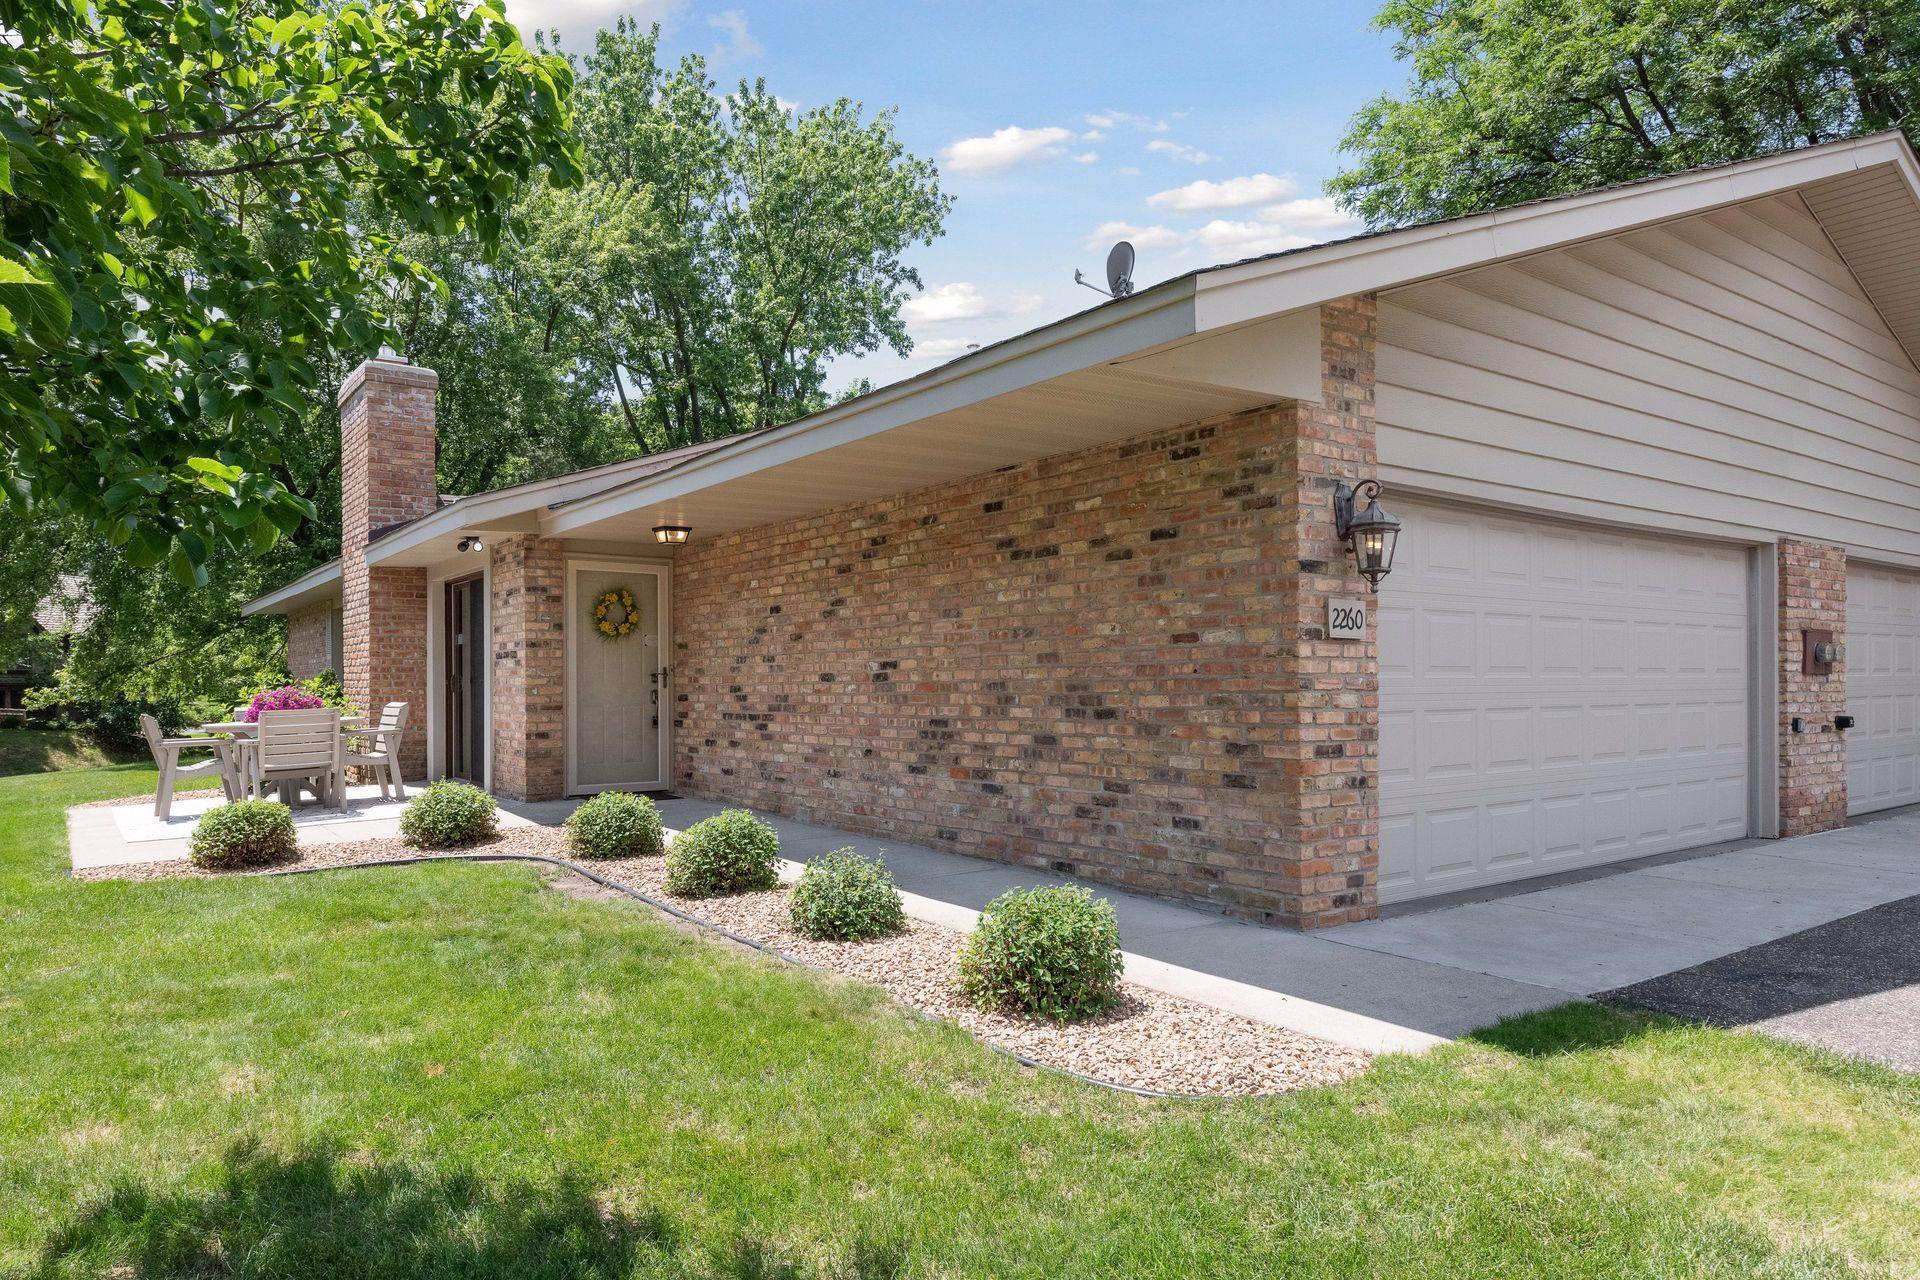 2260 Wildwood Circle Property Photo - Minnetonka, MN real estate listing